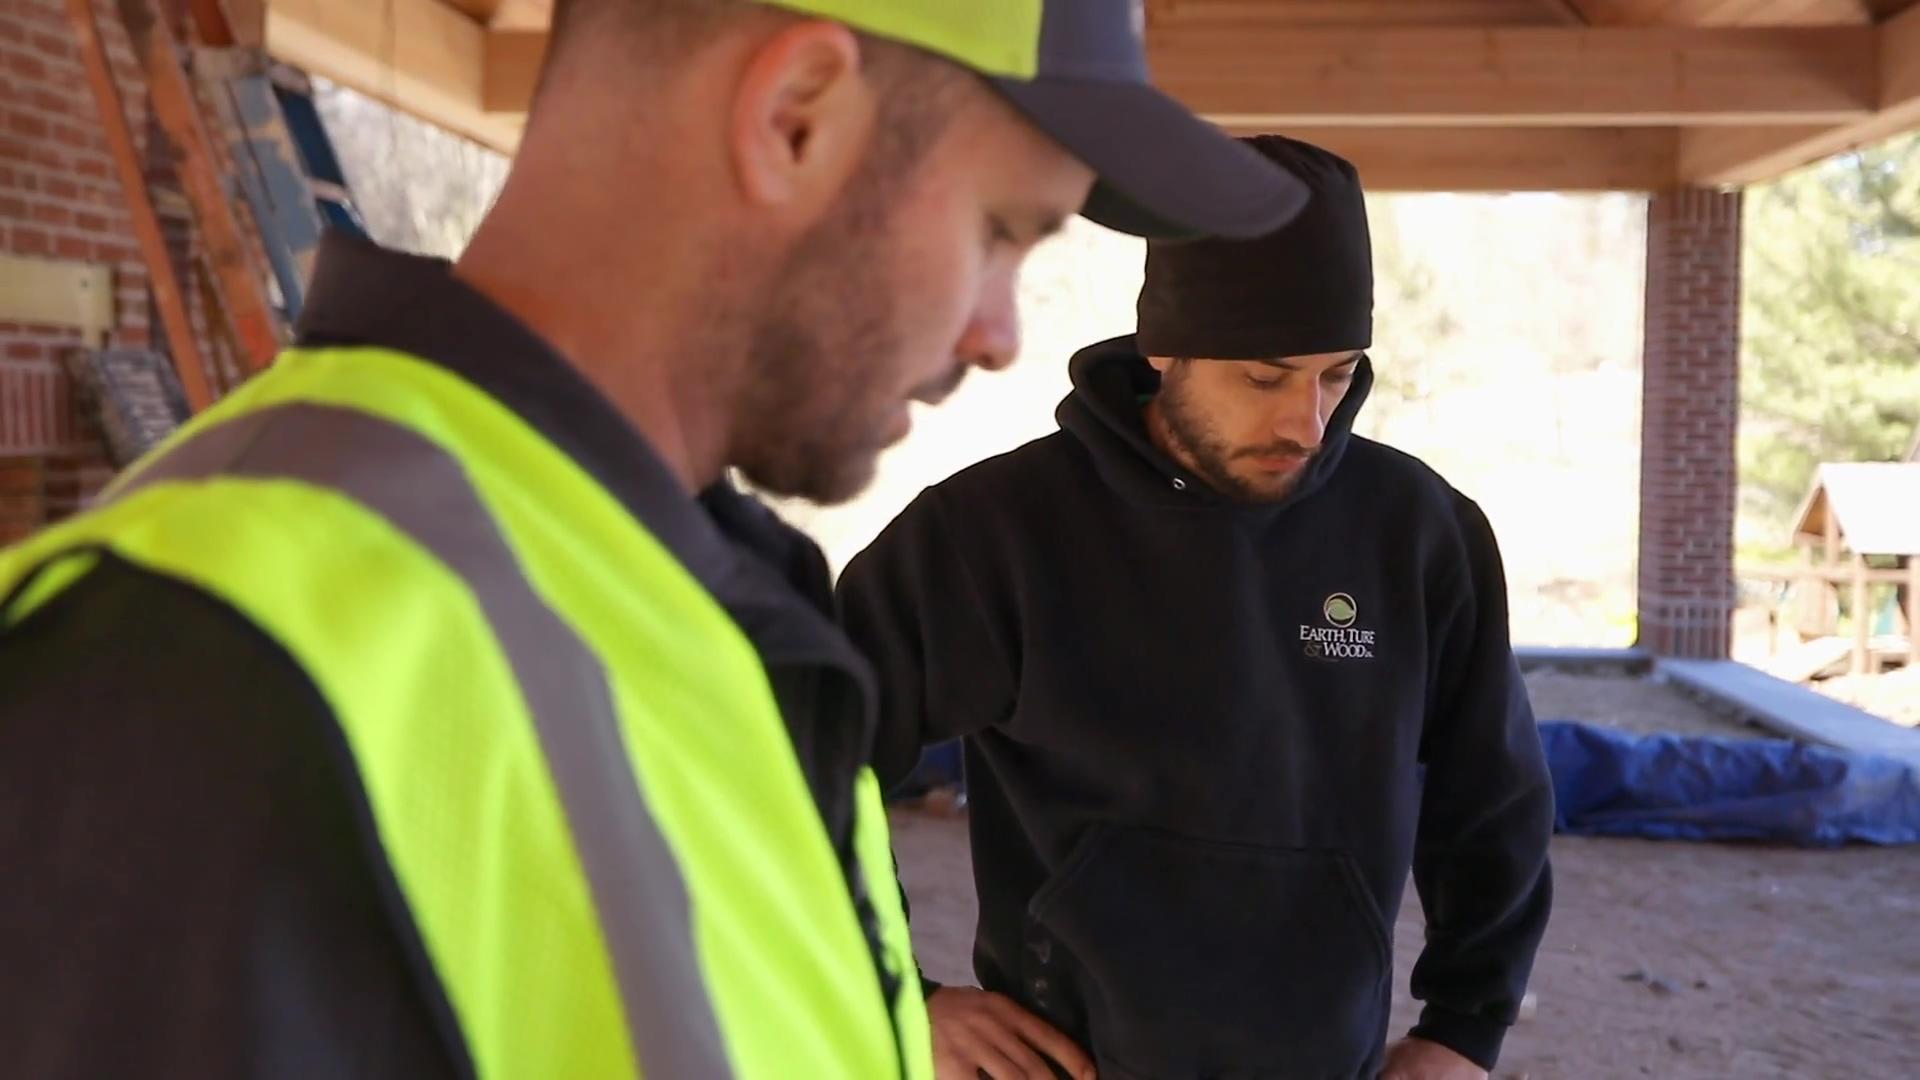 Landscaping Jobs Earth Turf Wood Careers